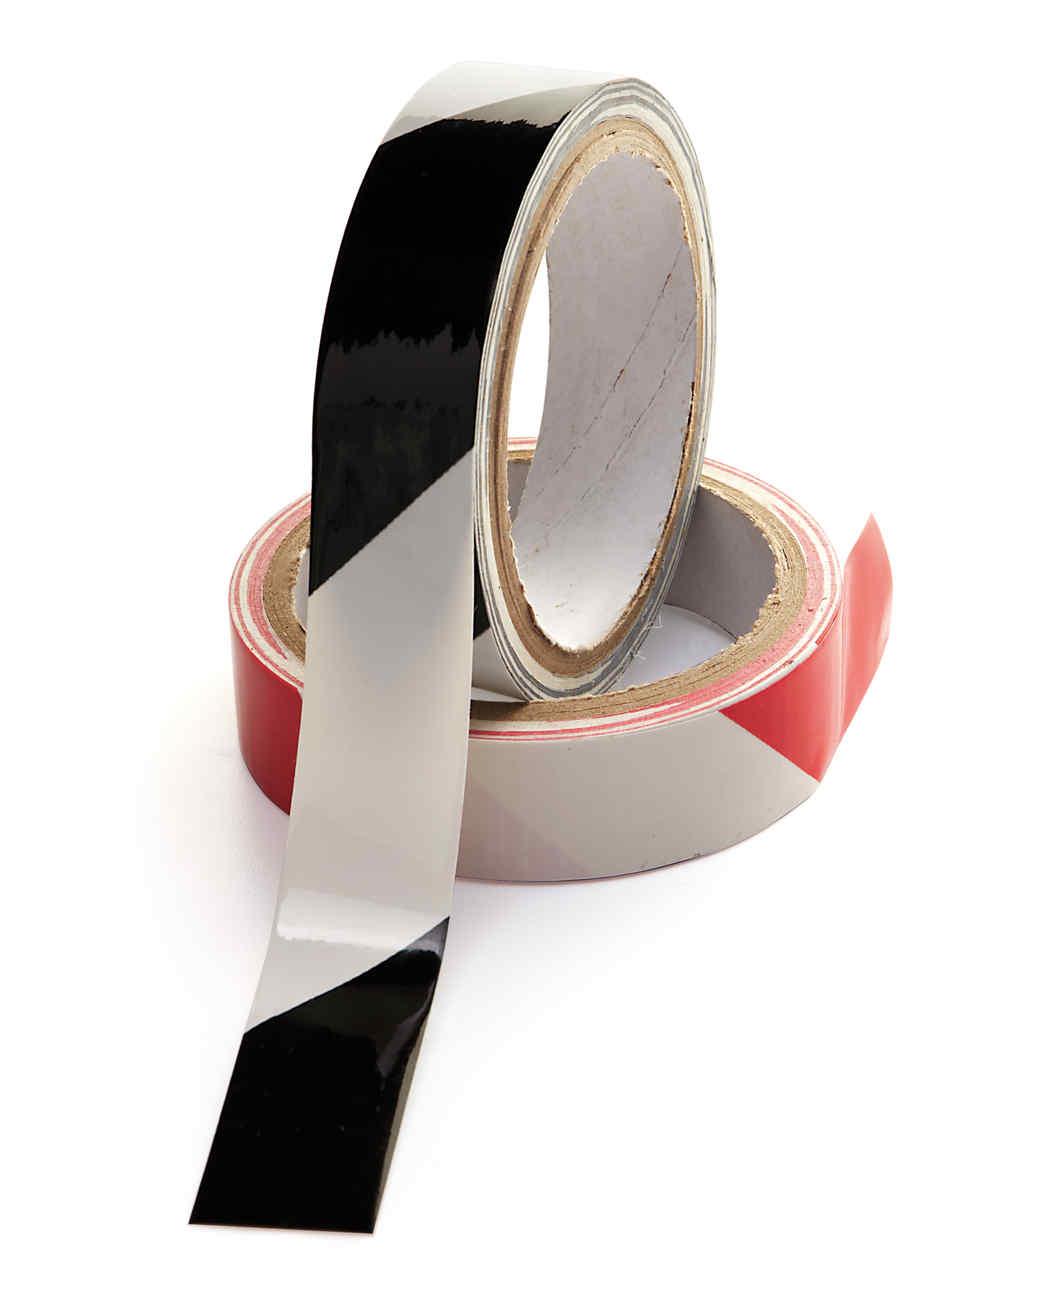 tape-021-mld109144.jpg